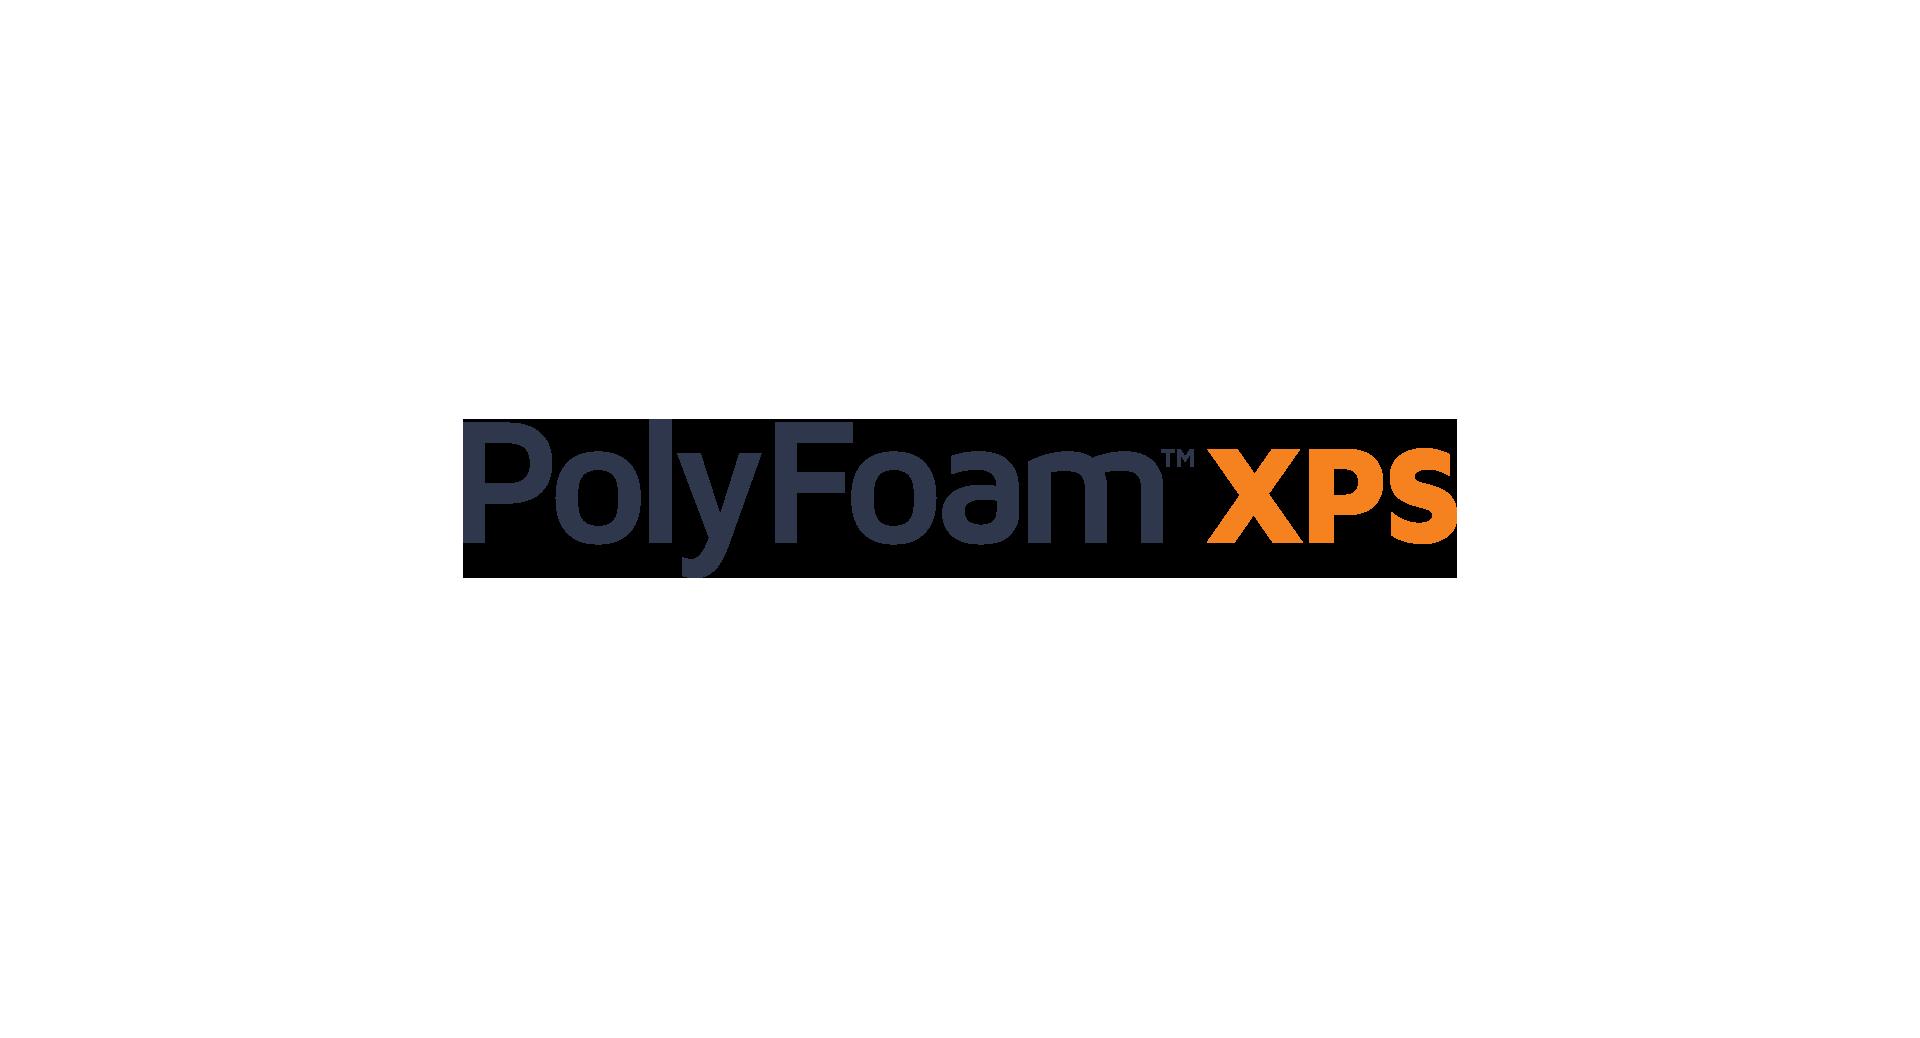 Polyfoam XPS branding